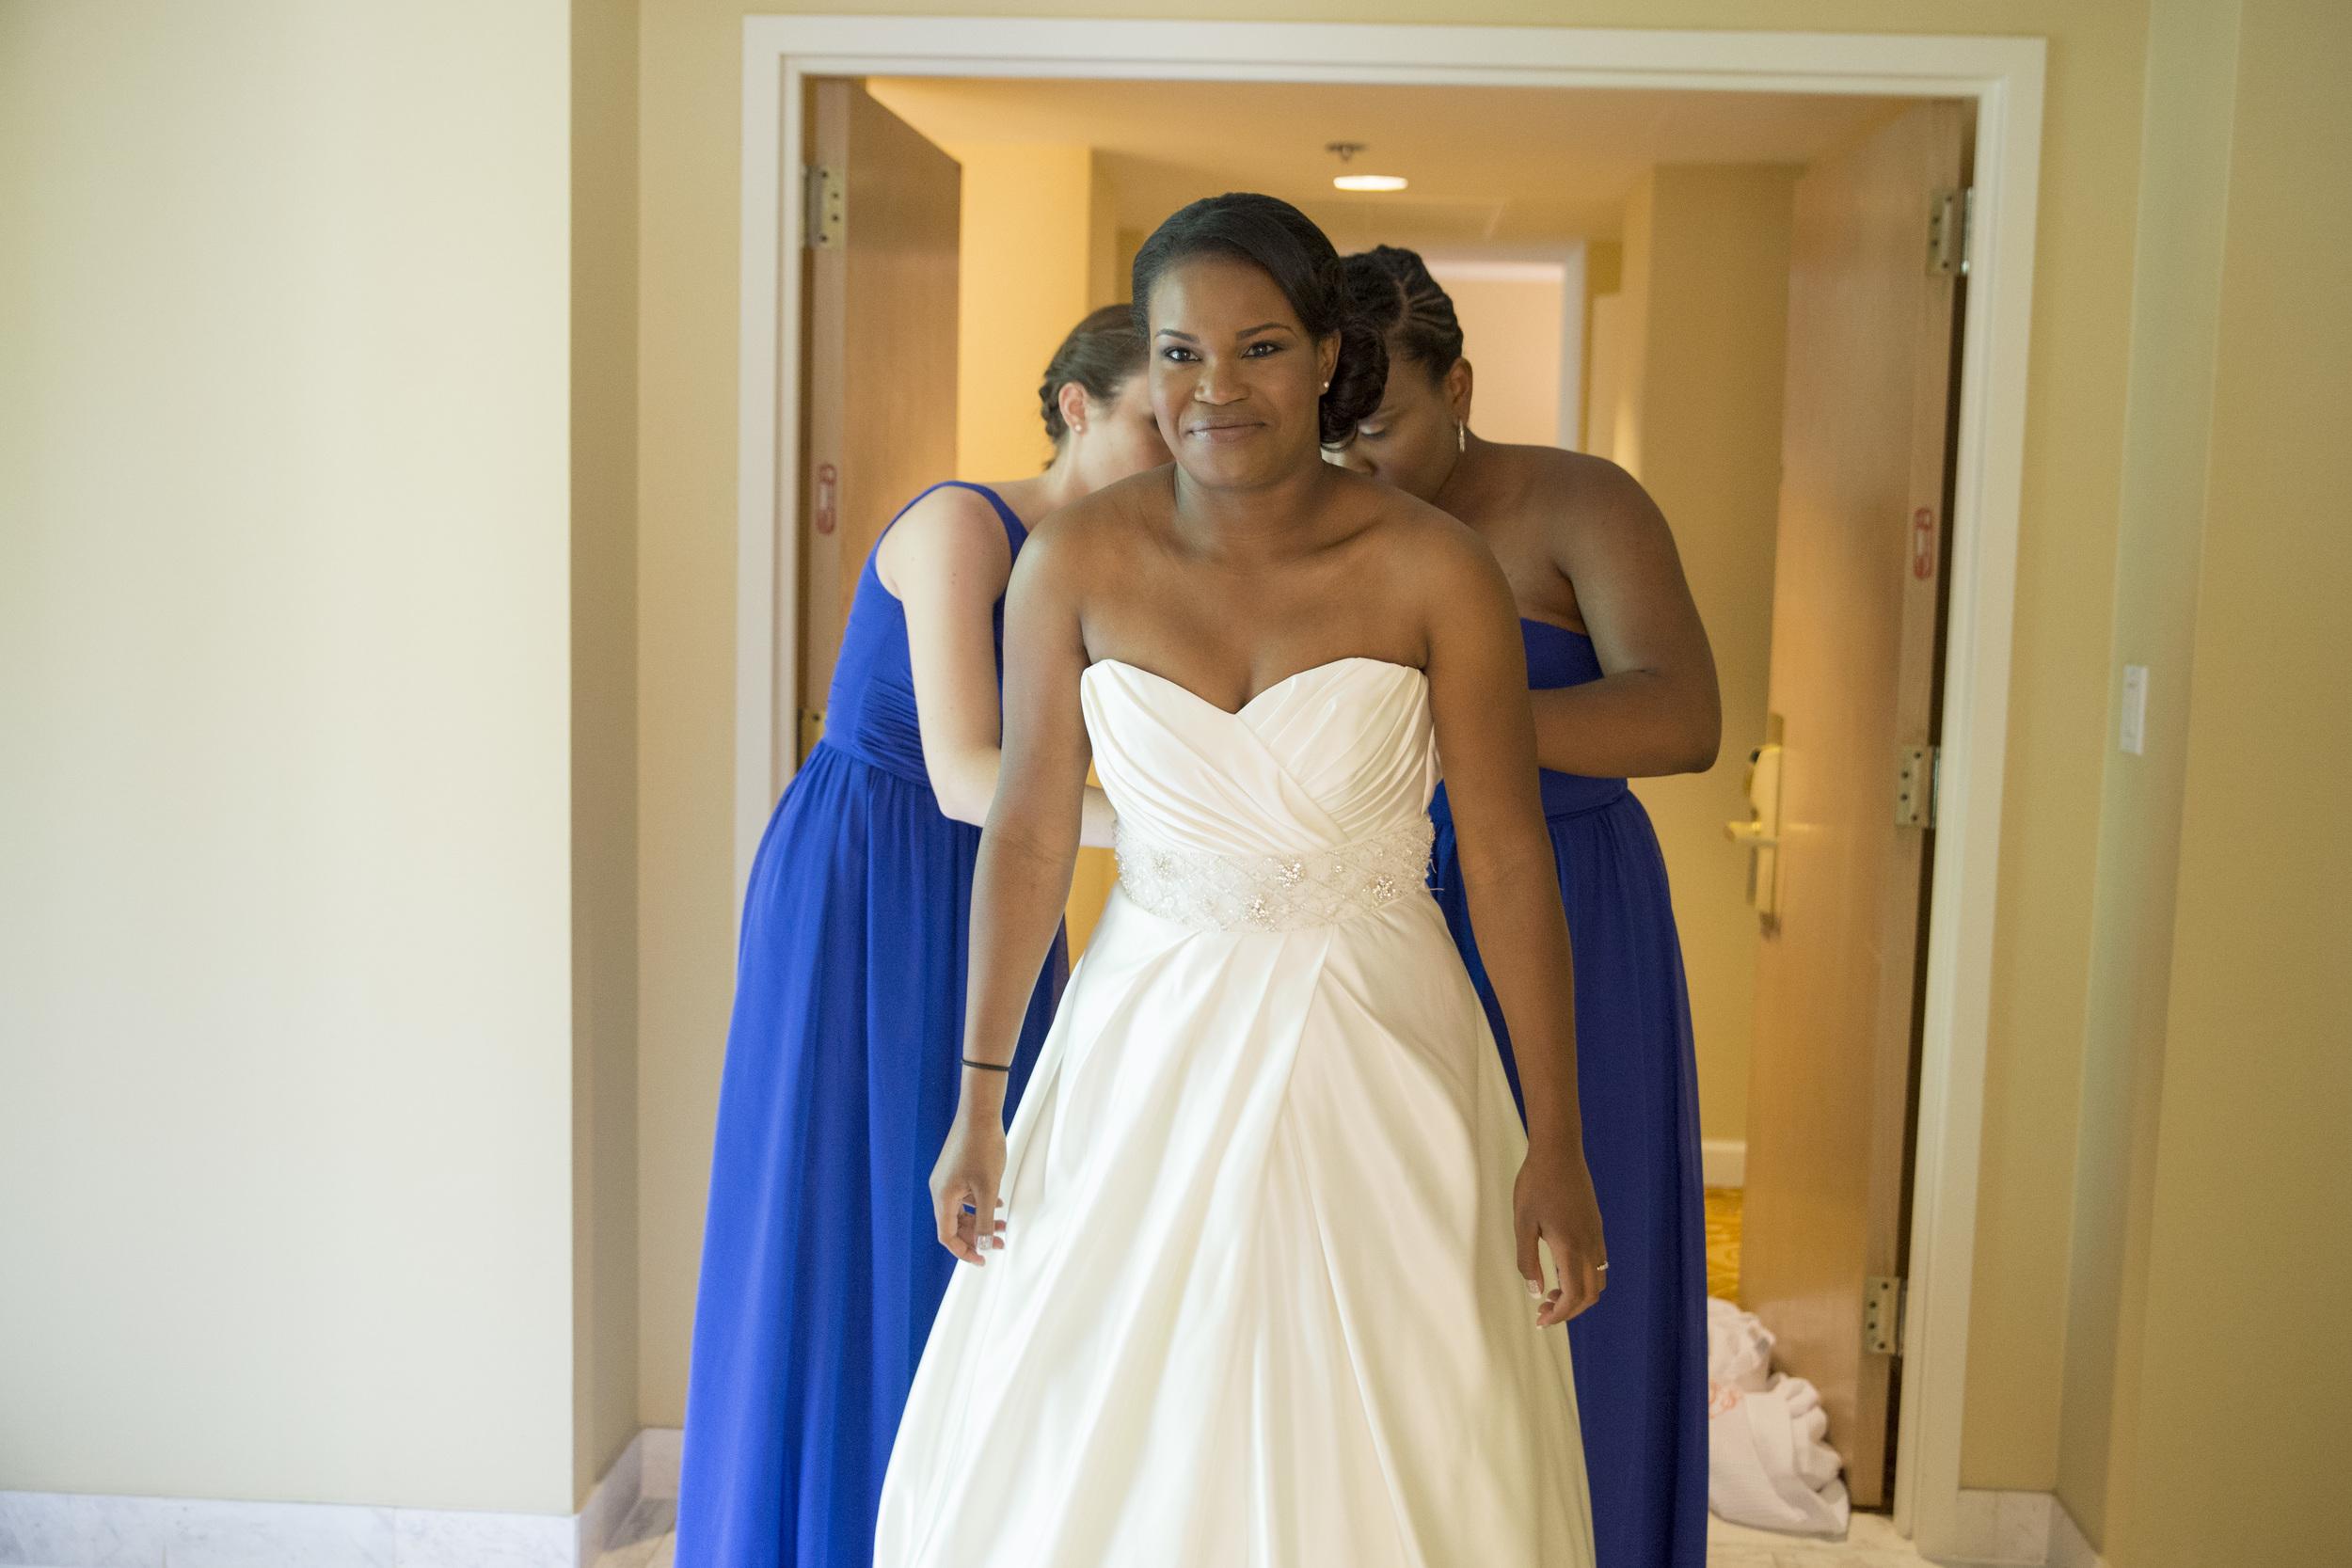 mount_vernon_summer_wedding_lynchburg_va006.jpg